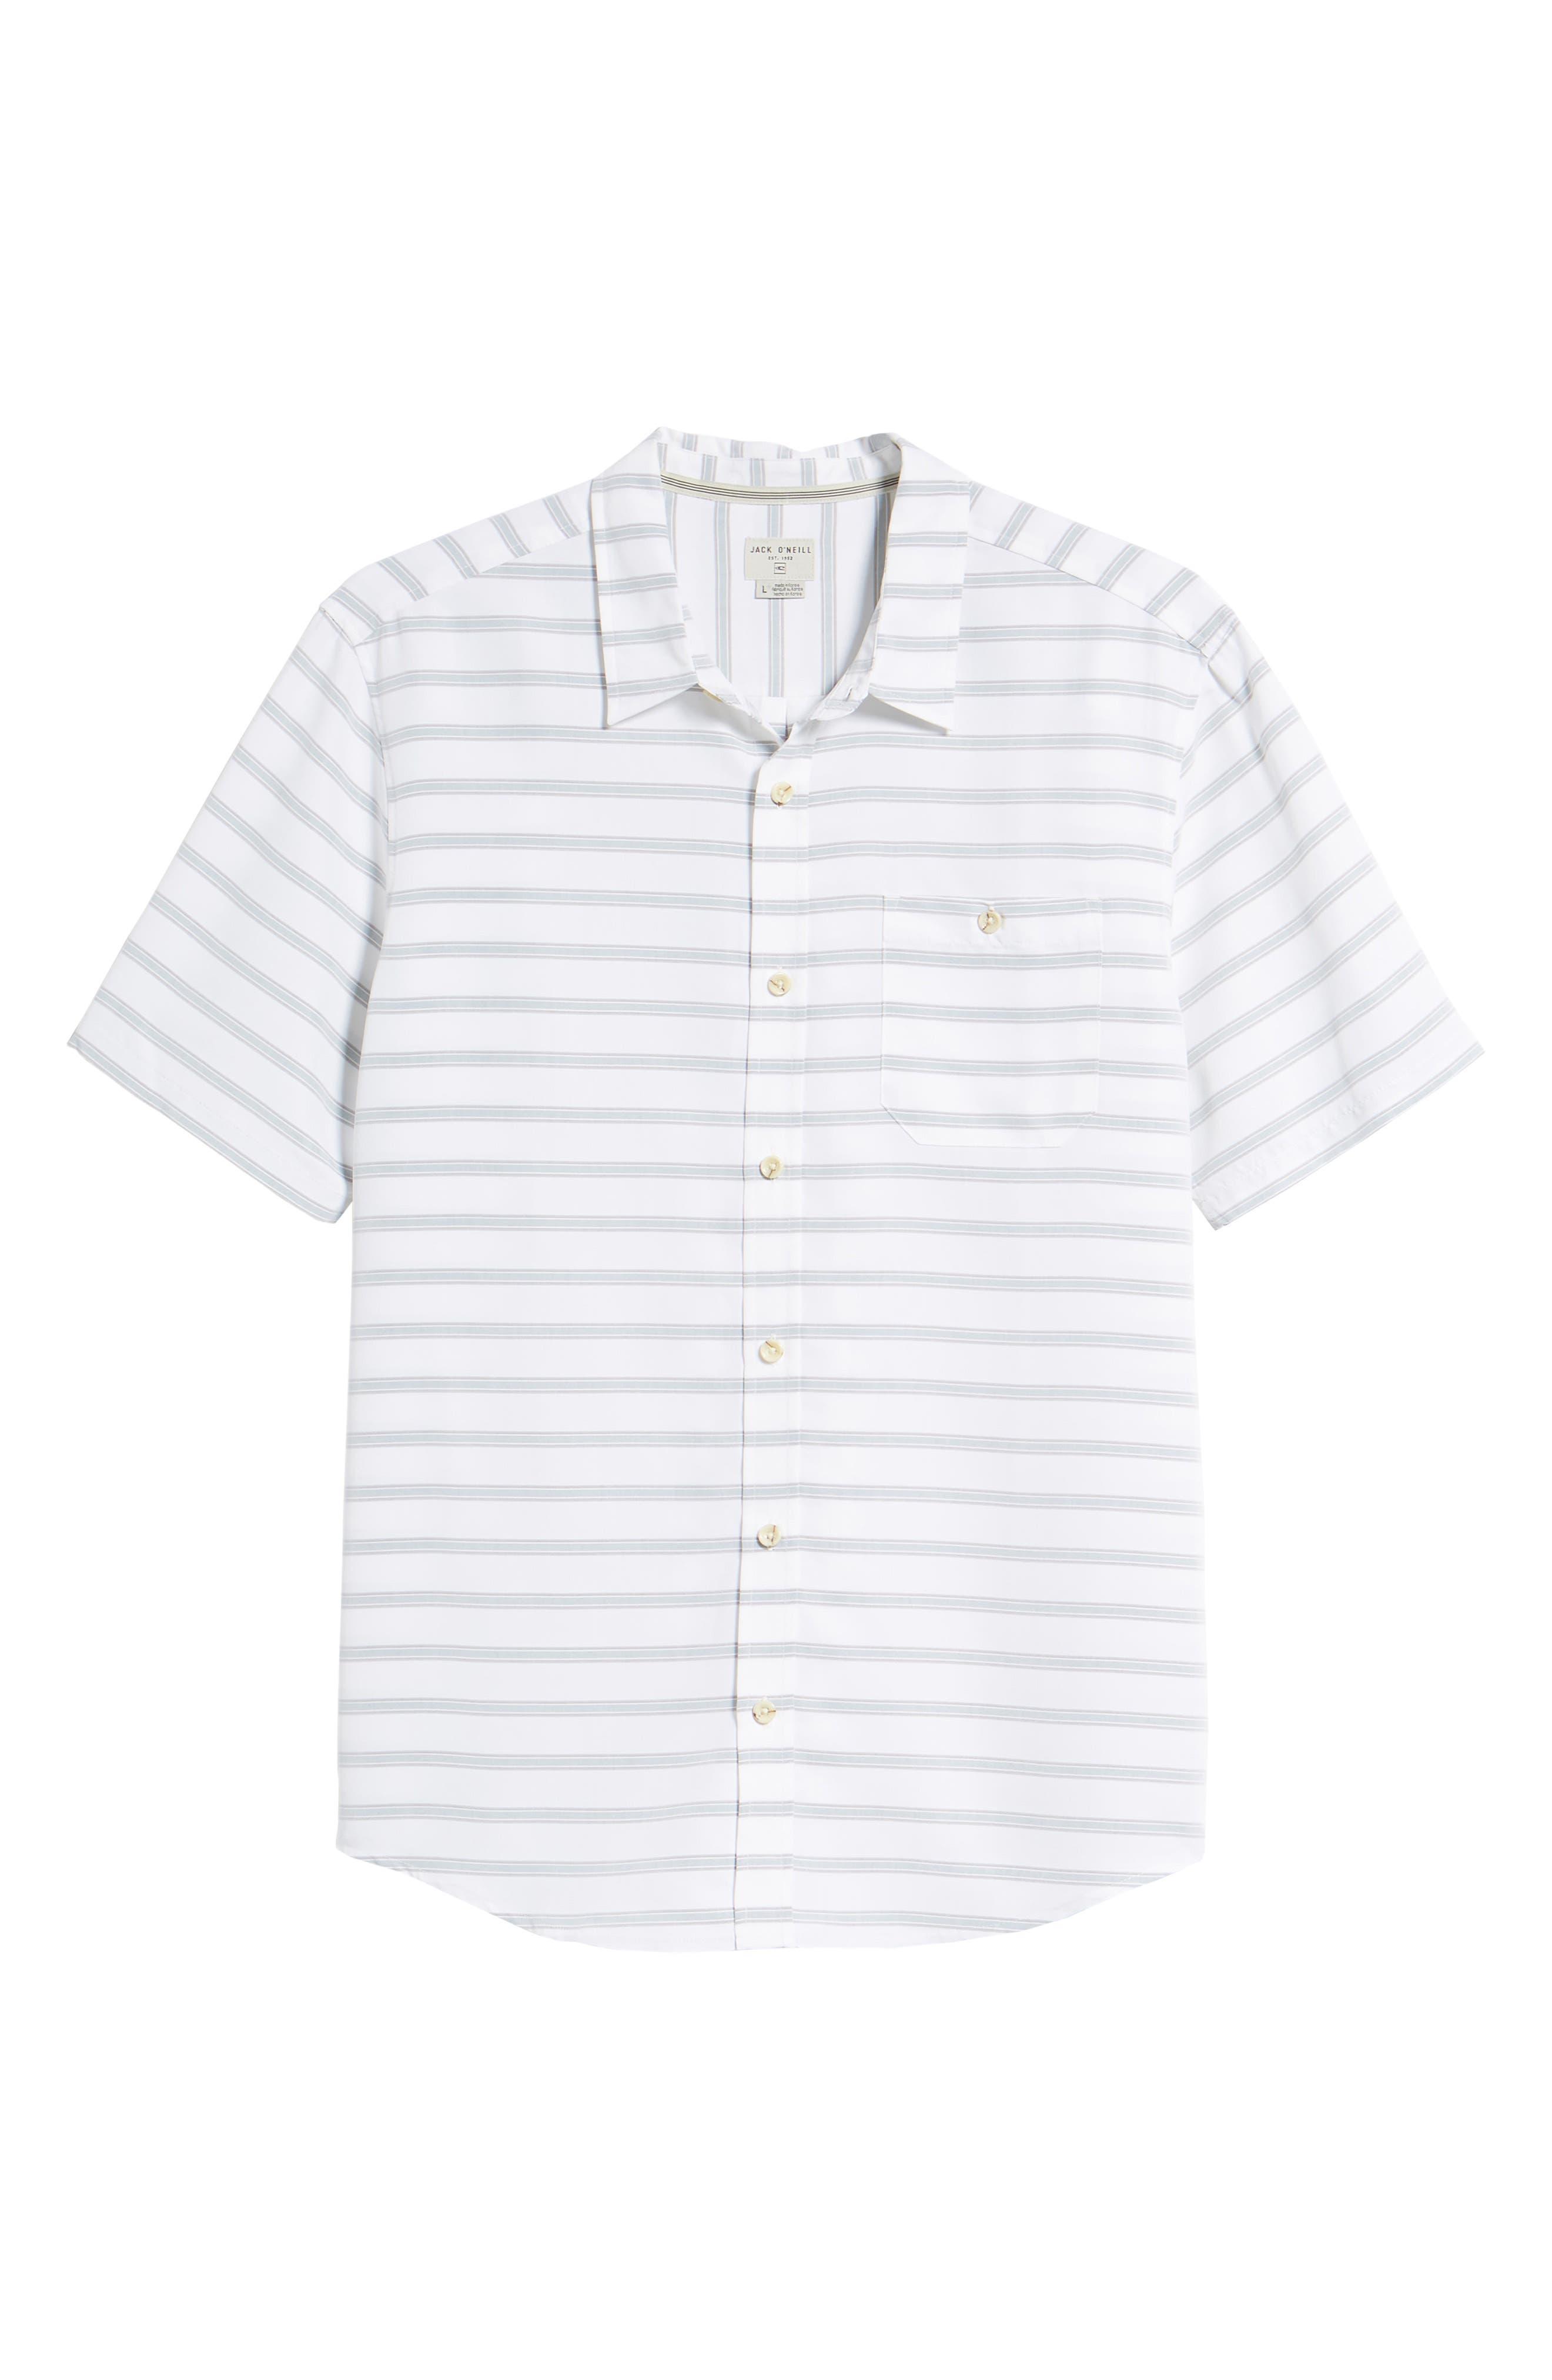 Slow Ride Sport Shirt,                             Alternate thumbnail 6, color,                             White